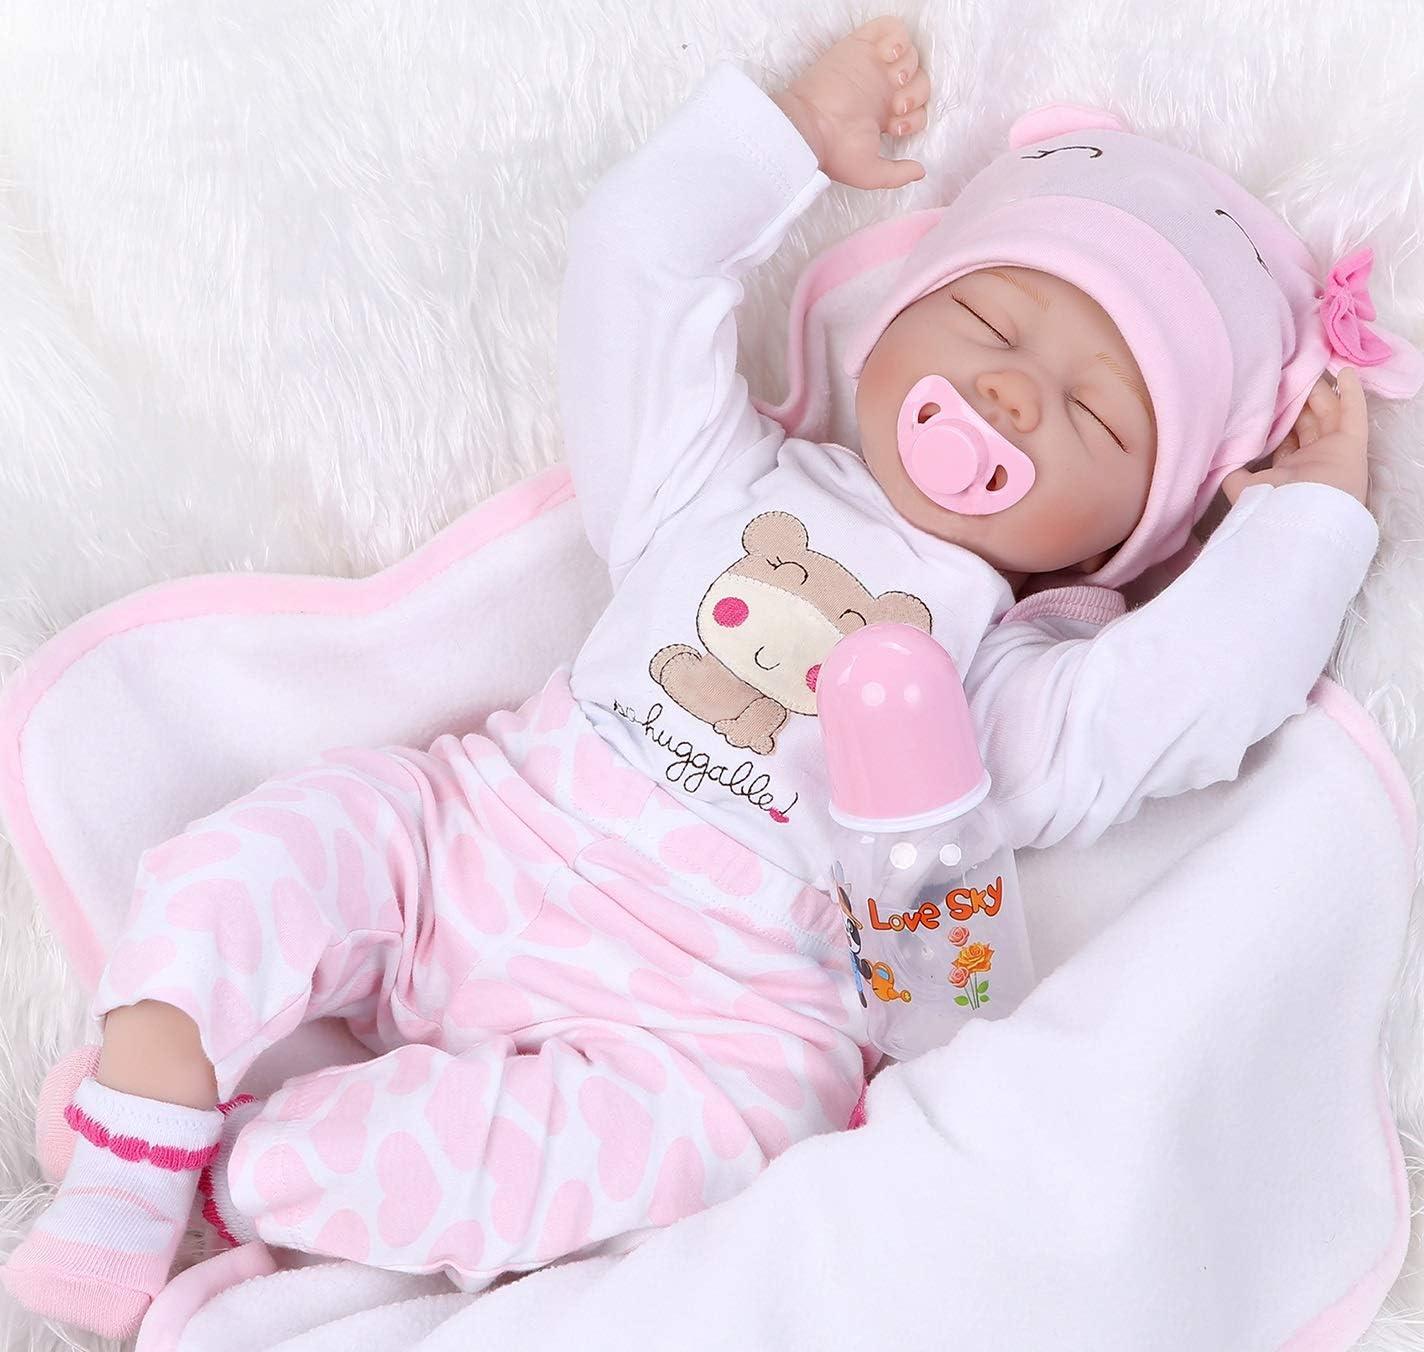 Reborn Award Baby Doll Soft Simulation Silicone 55cm Vinyl Popular overseas Lo I 22inch